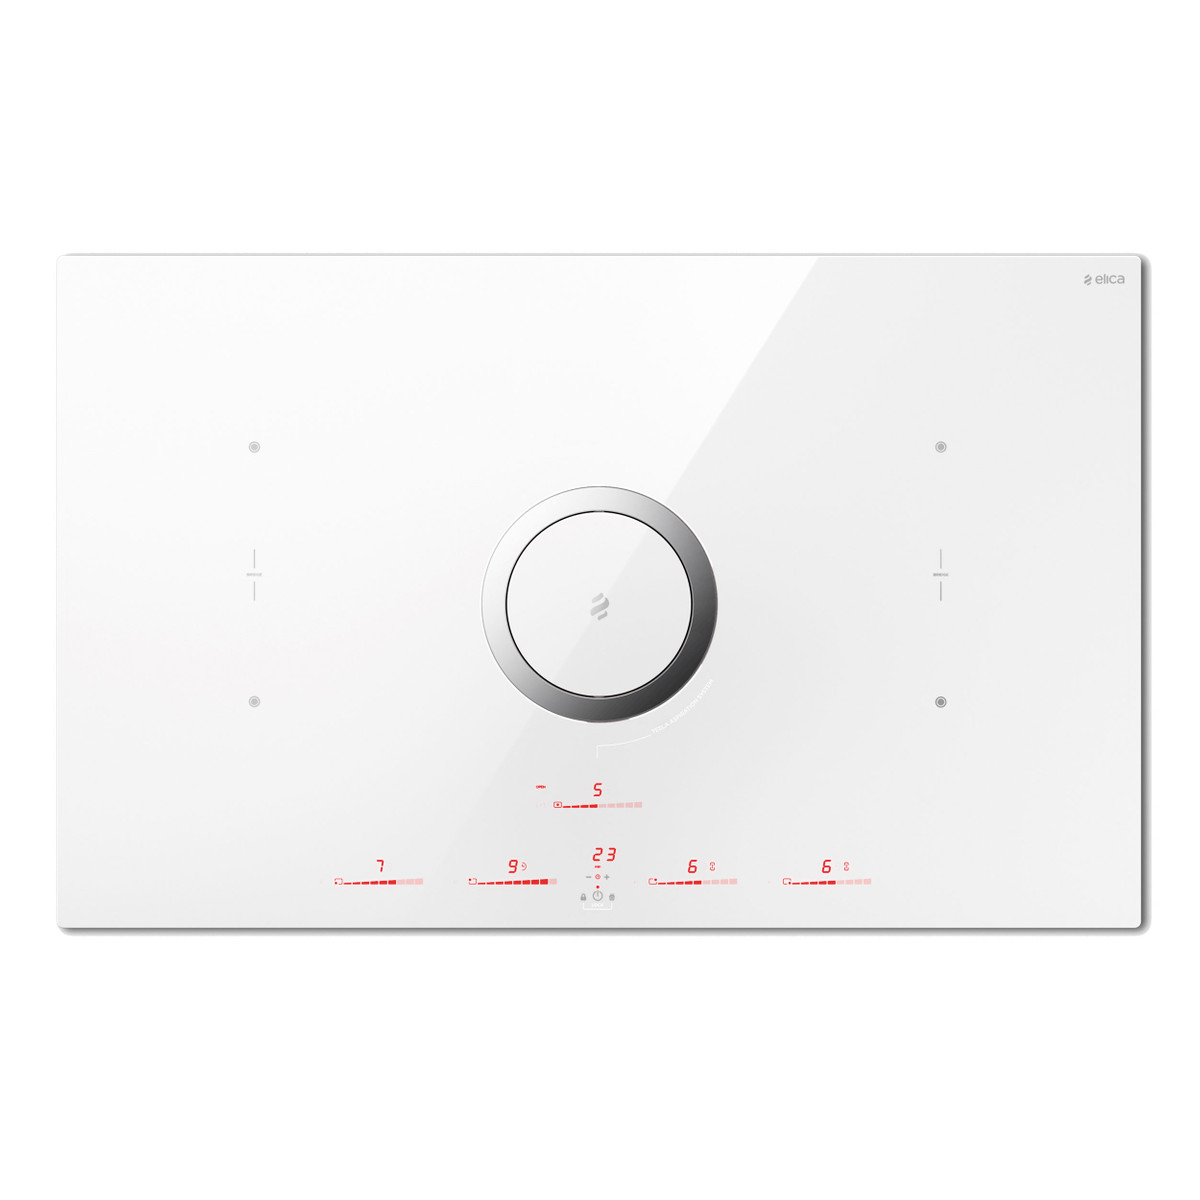 Elica NikolaTesla Switch PRF0146213 weiß, Umluftbetrieb  , Kochfeld mit integriertem Dunstabzug  – Bild 1